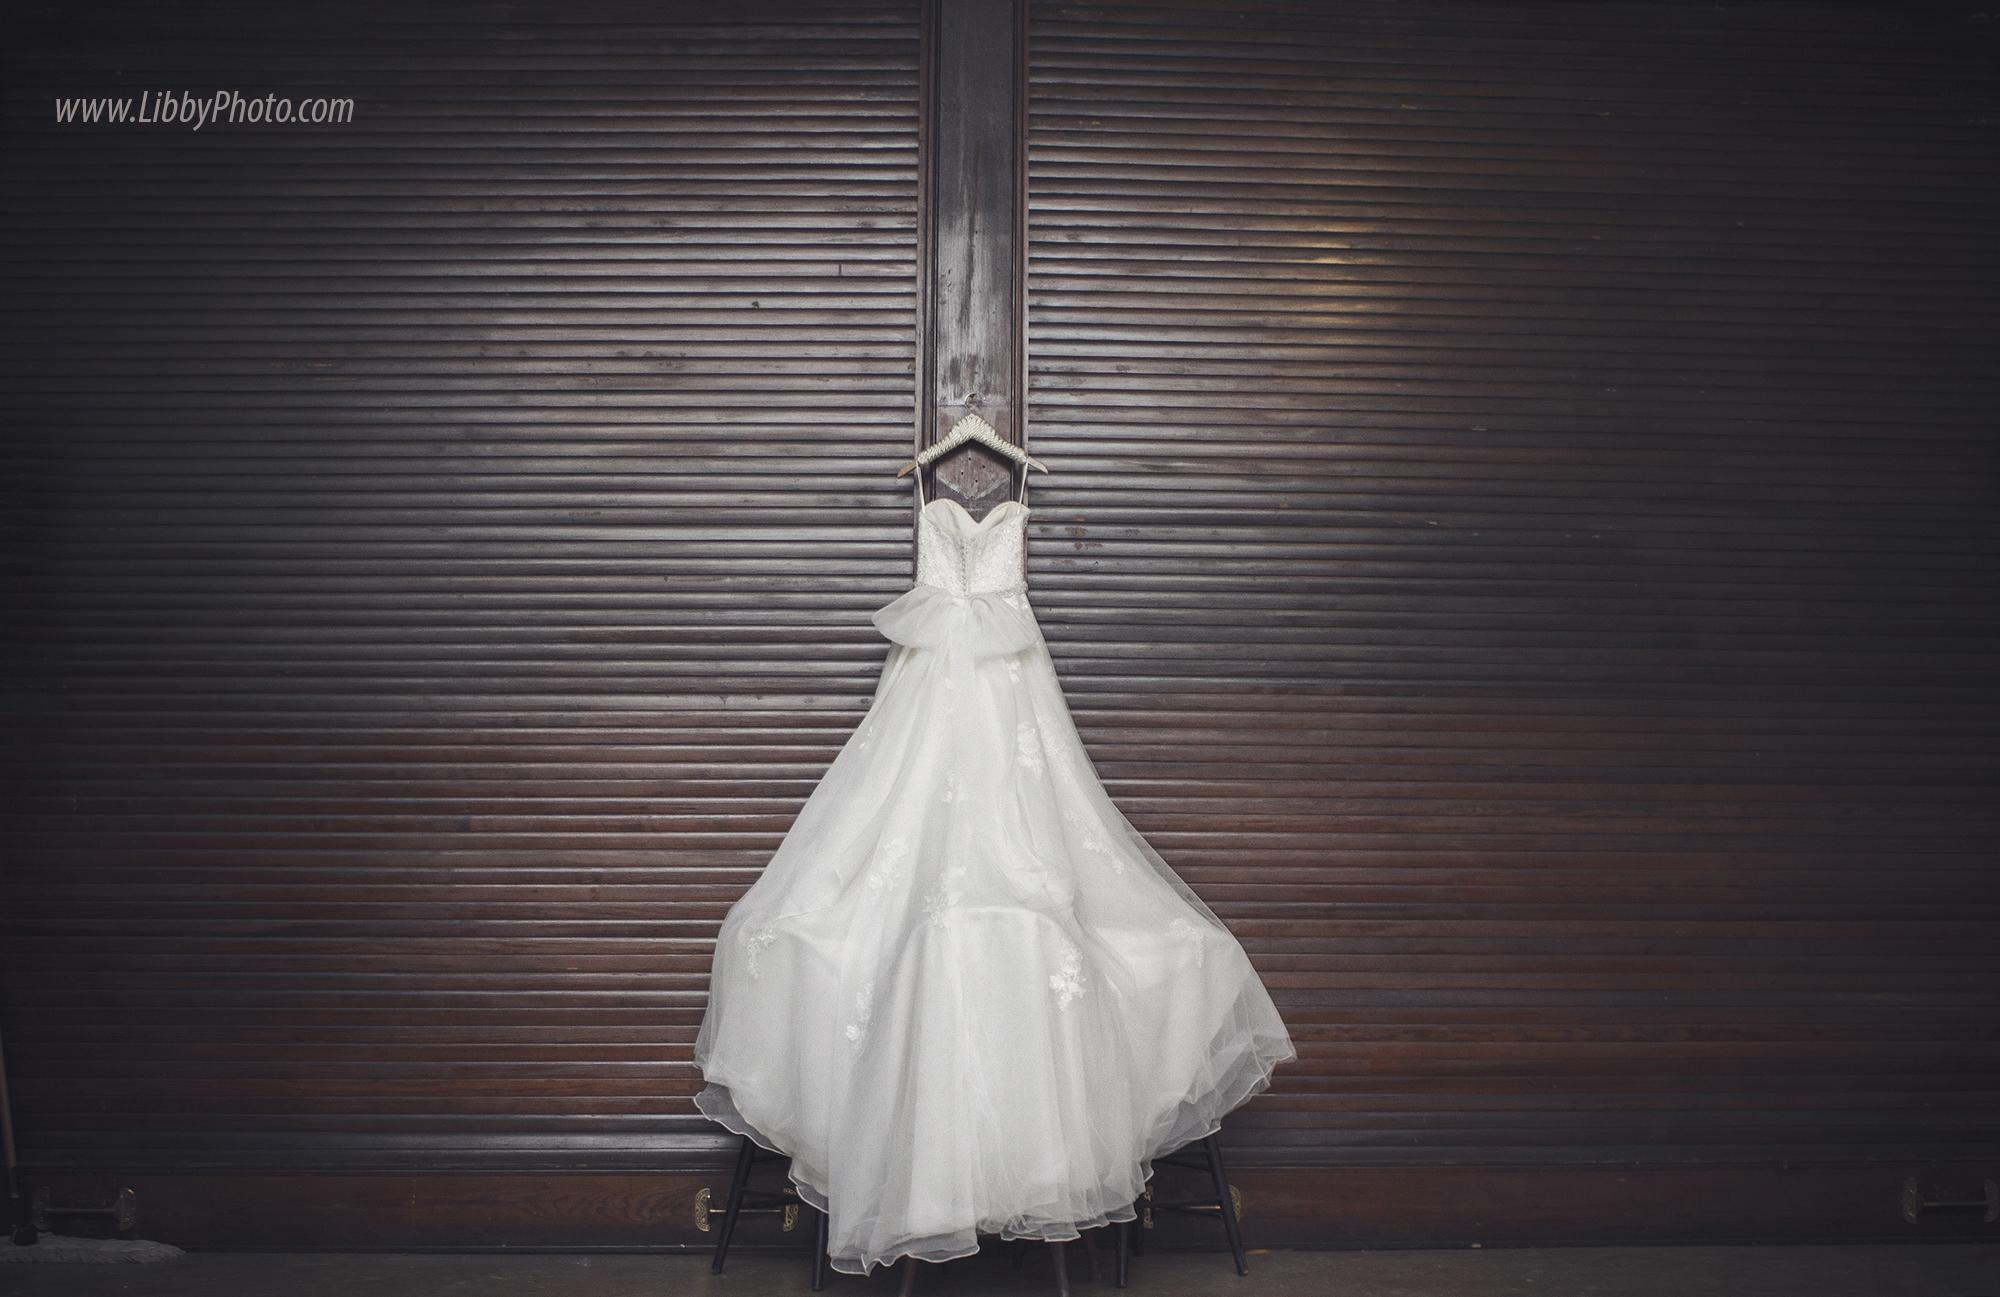 Atlanta wedding photography Libbyphoto (3).jpg